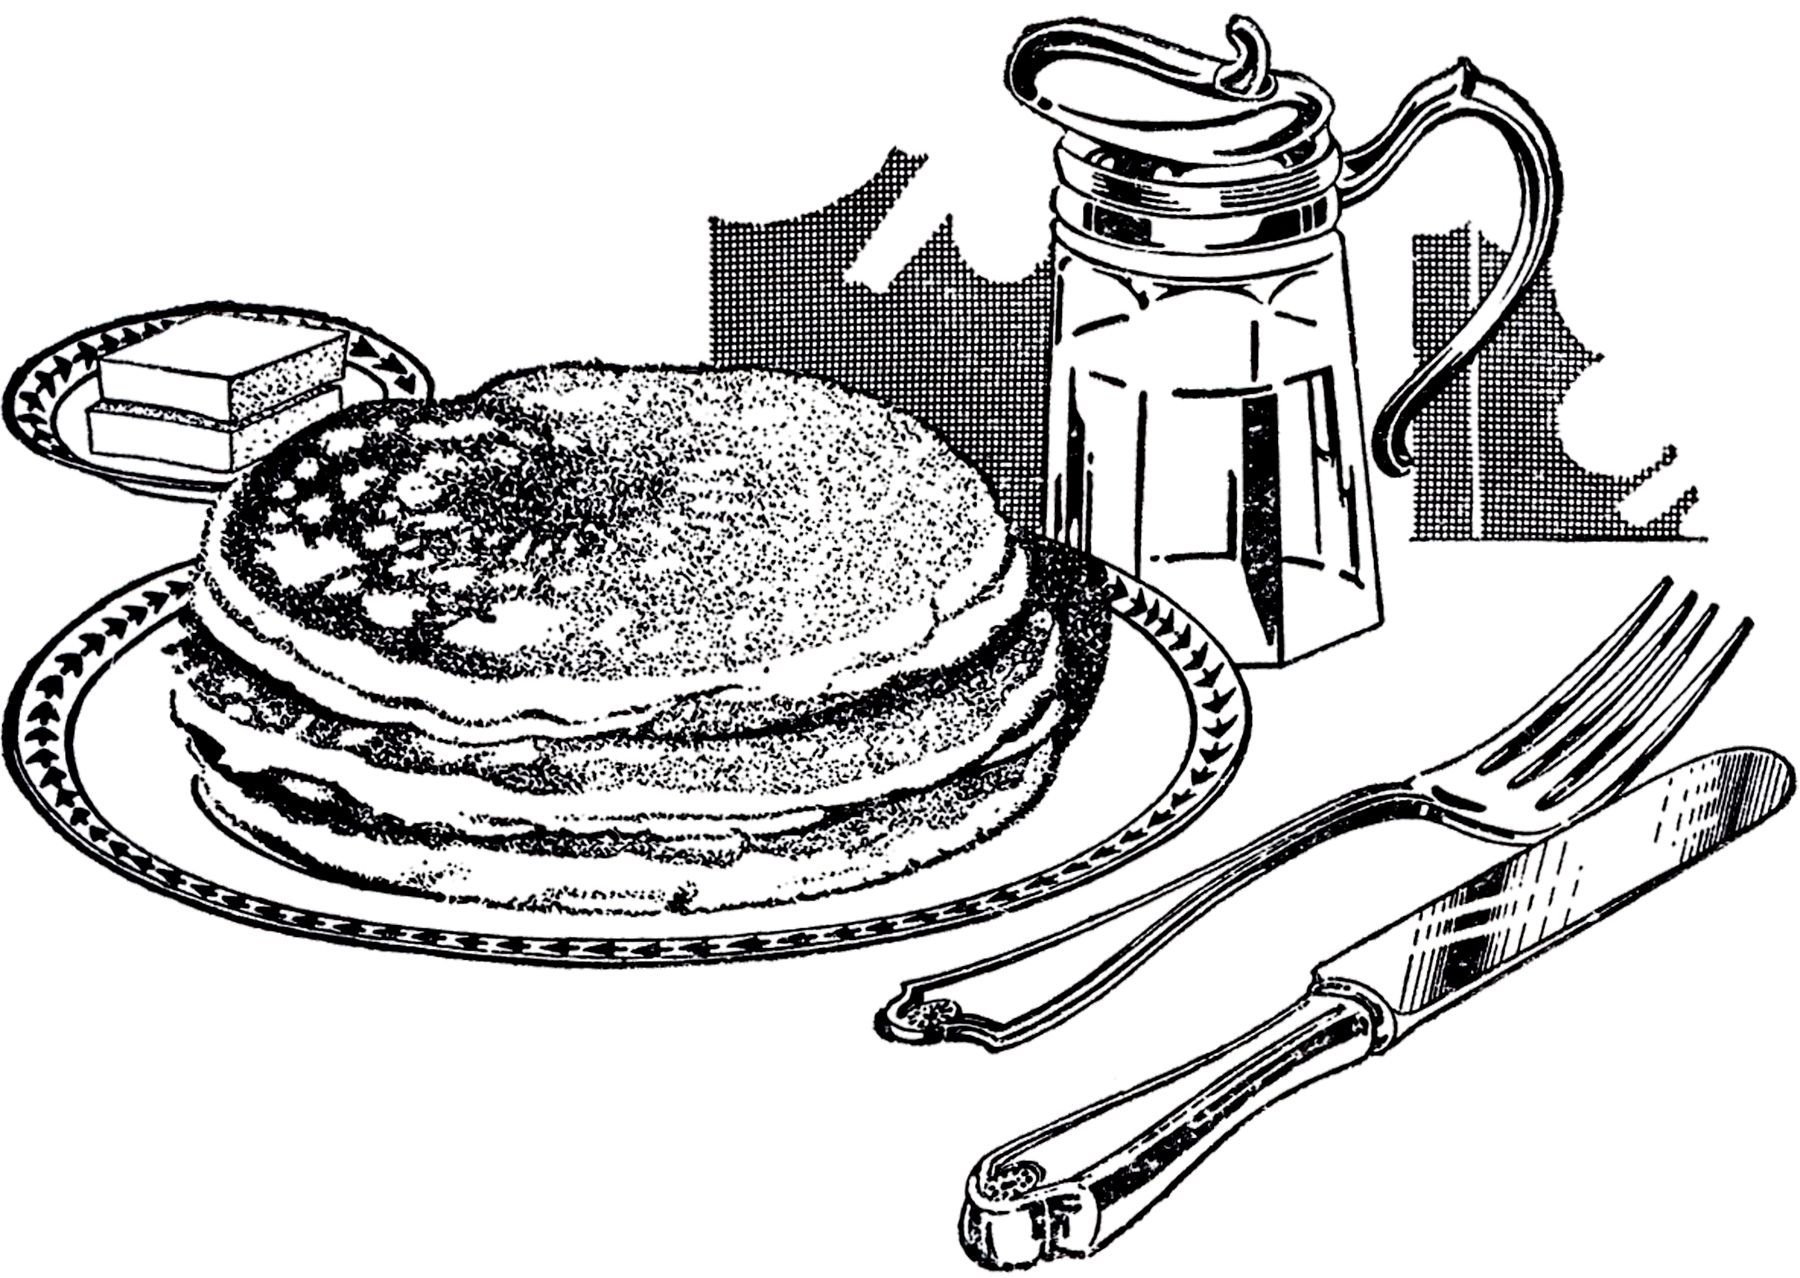 hight resolution of thegraphicsfairy com wp content uploads 2015 04 vintage pancake breakfast image